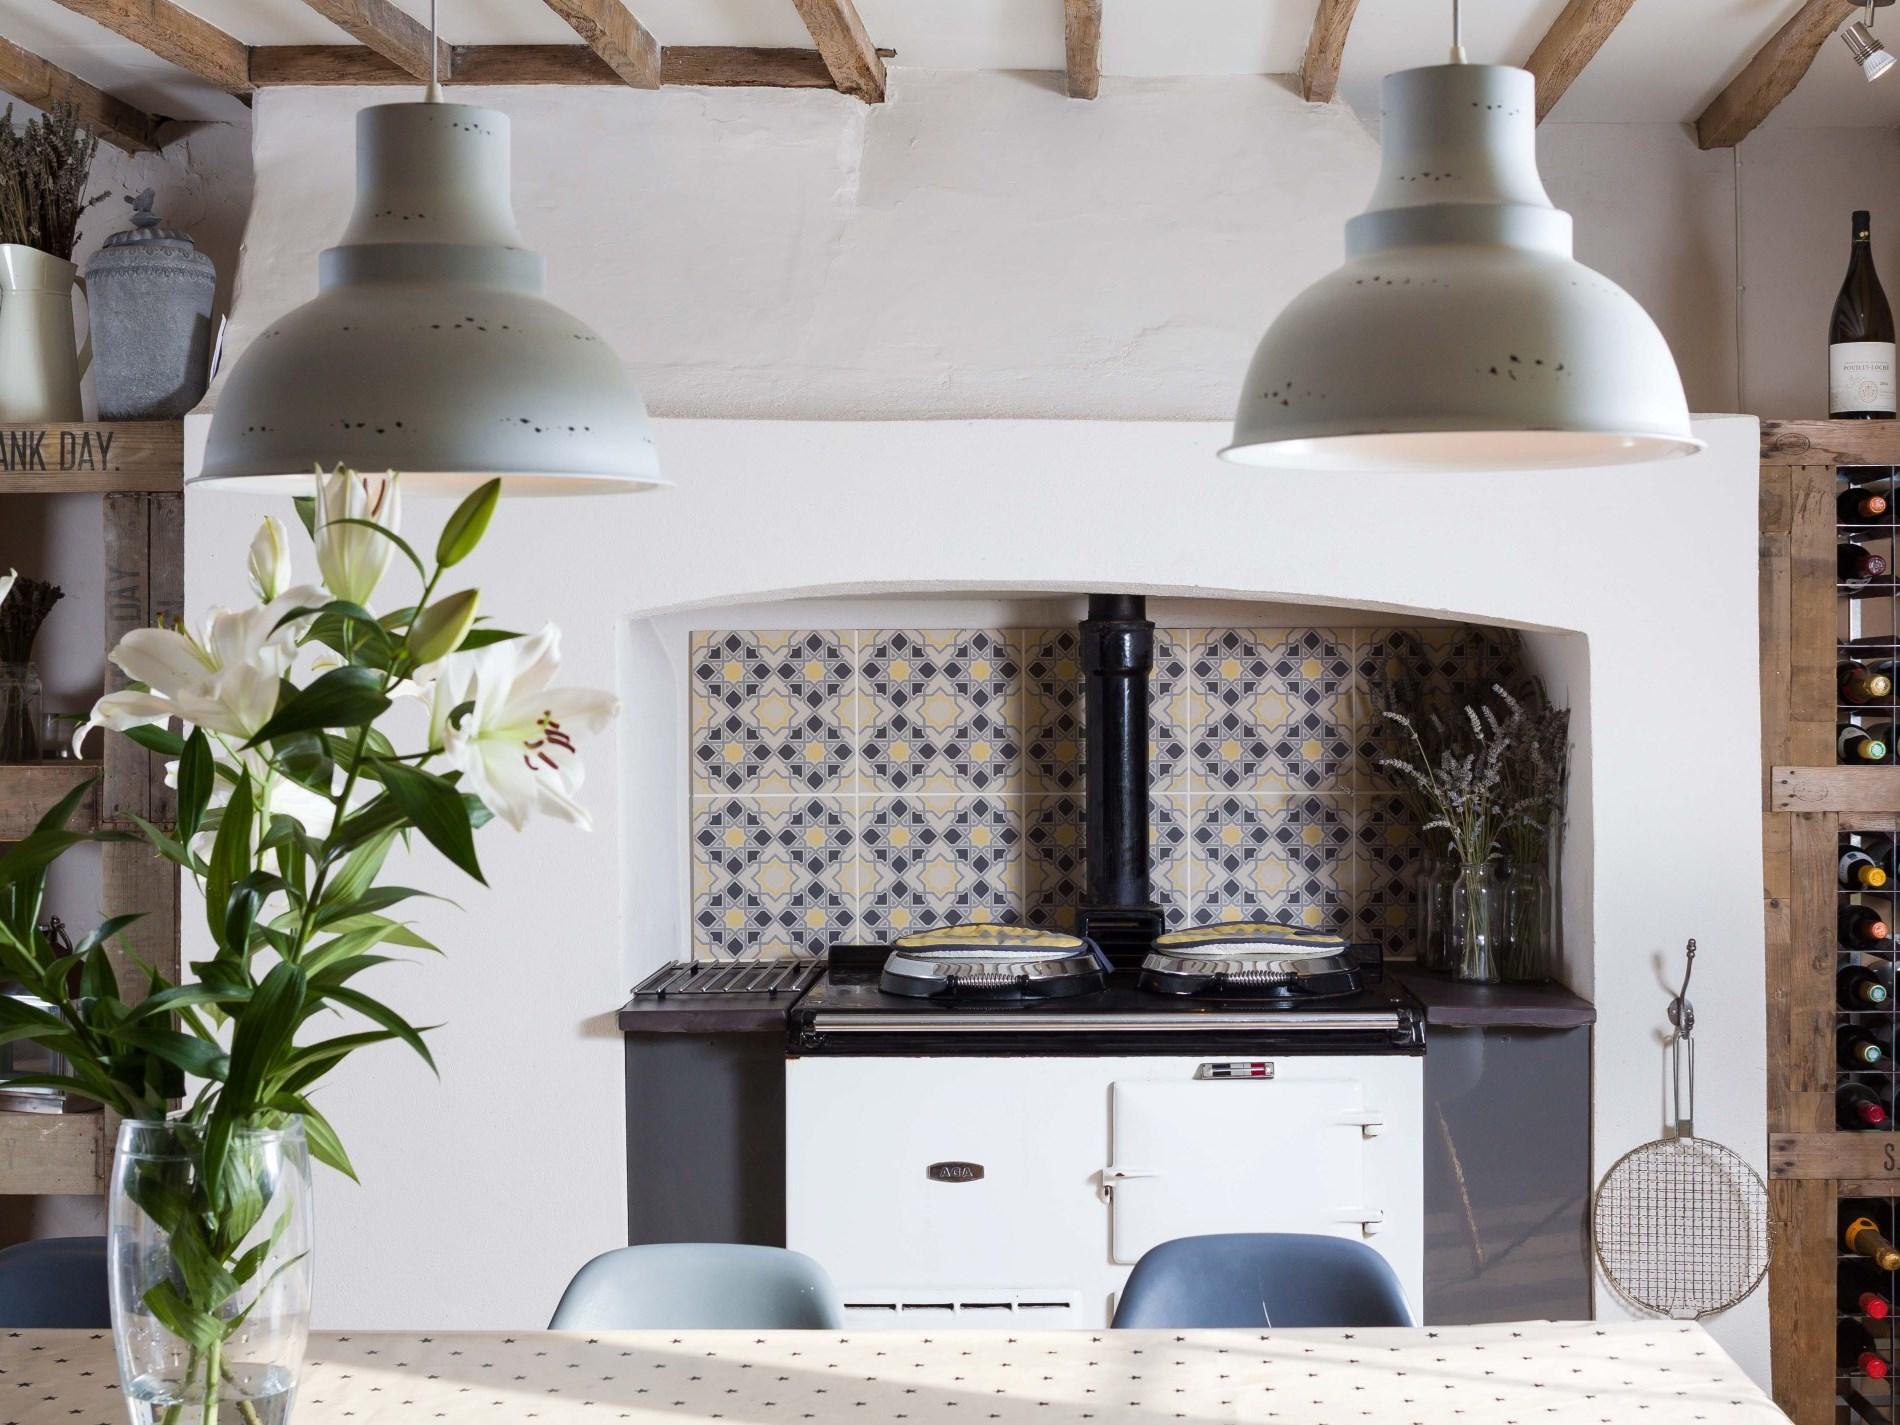 Kitchen with original Aga